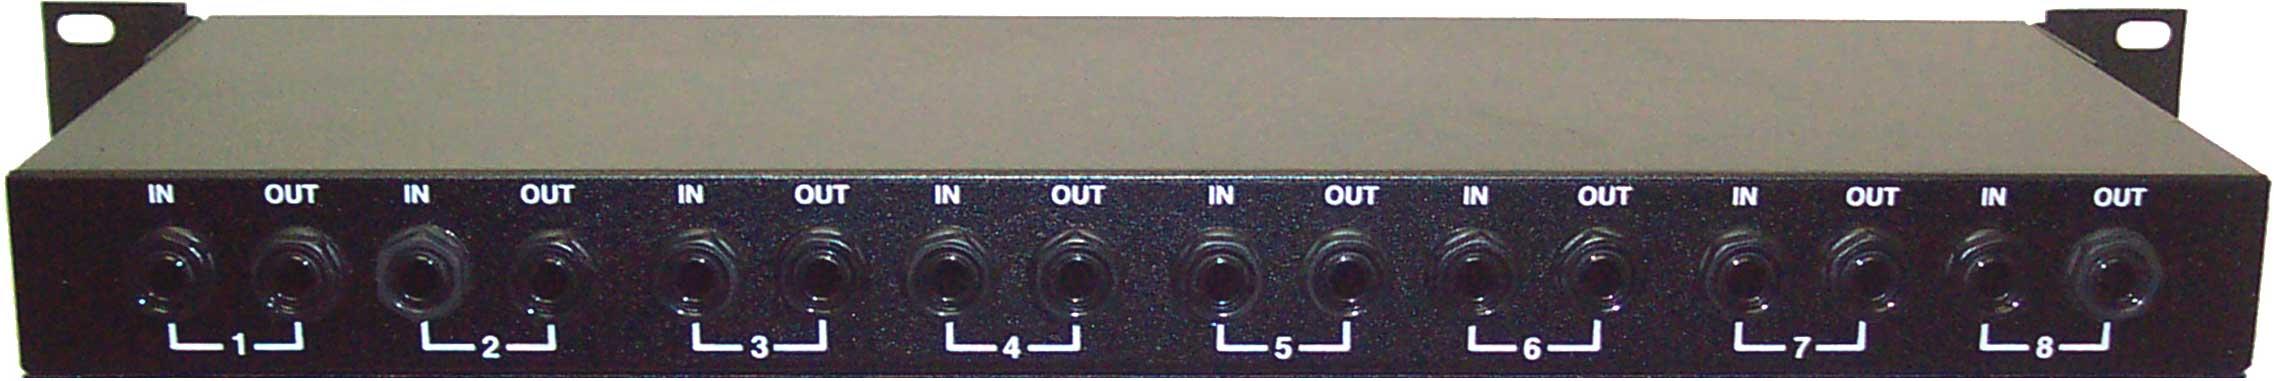 8 channel rack box